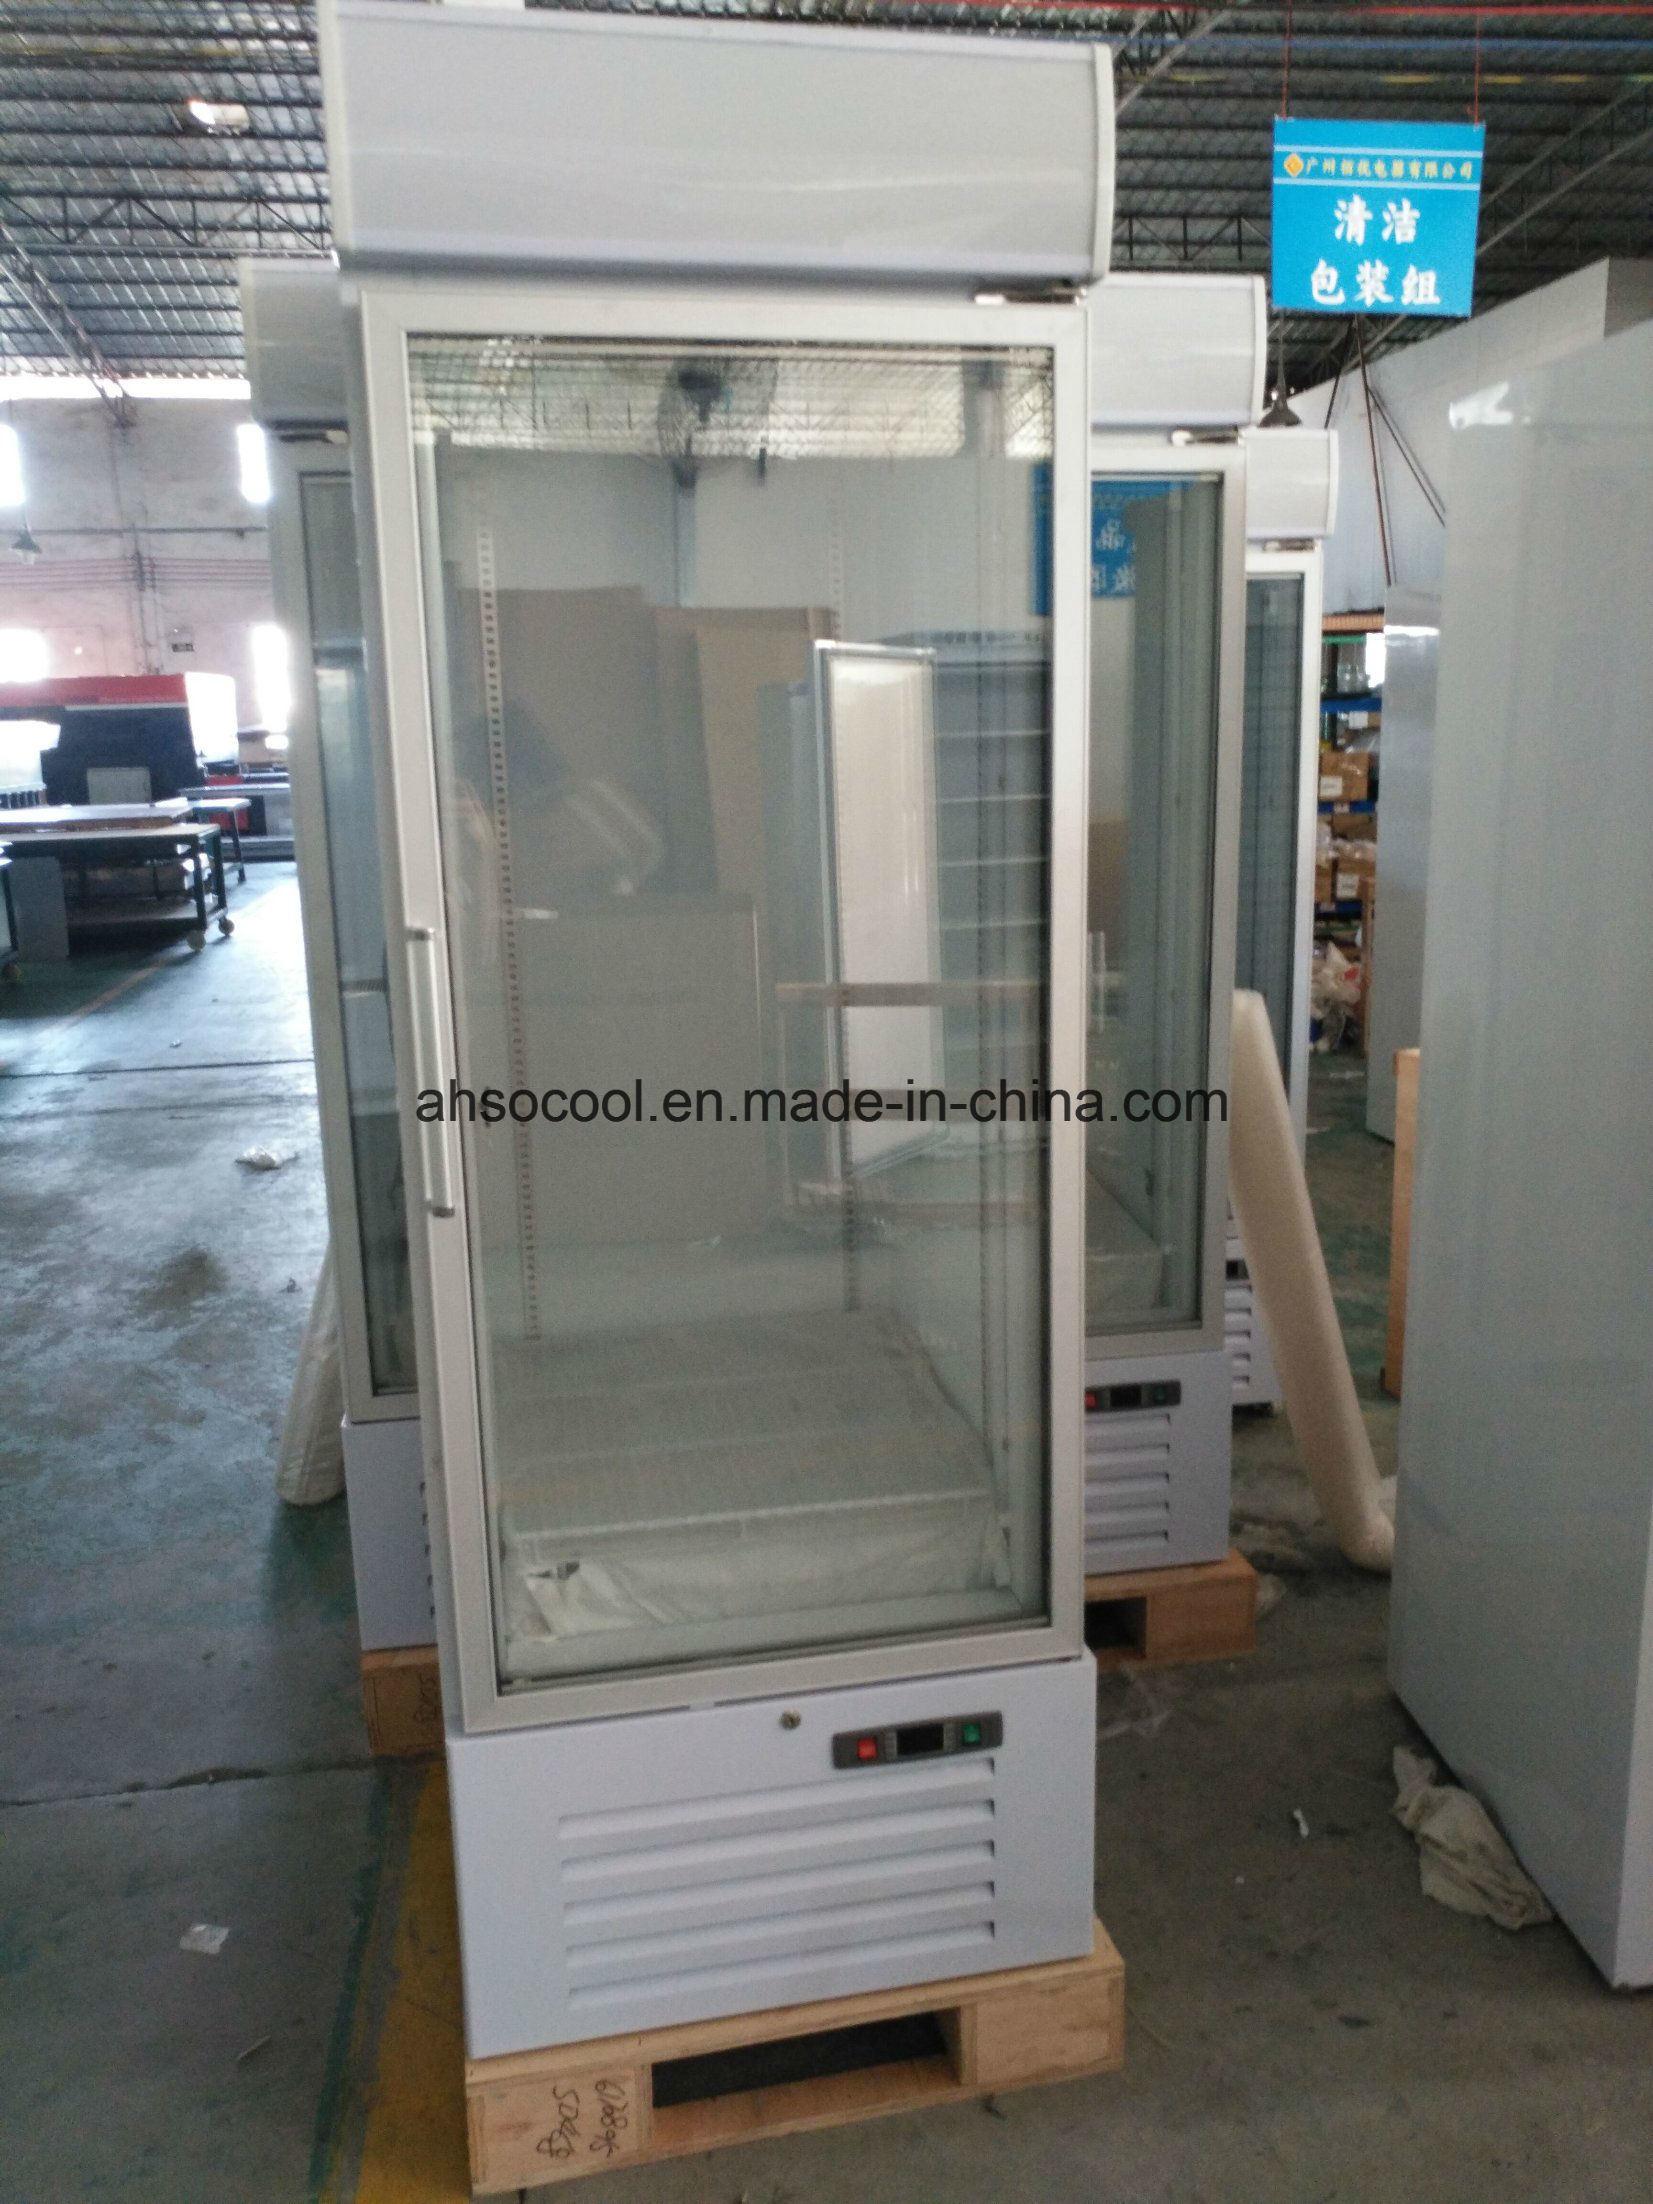 China Single Glass Door Upright Display Freezer For Supermarket